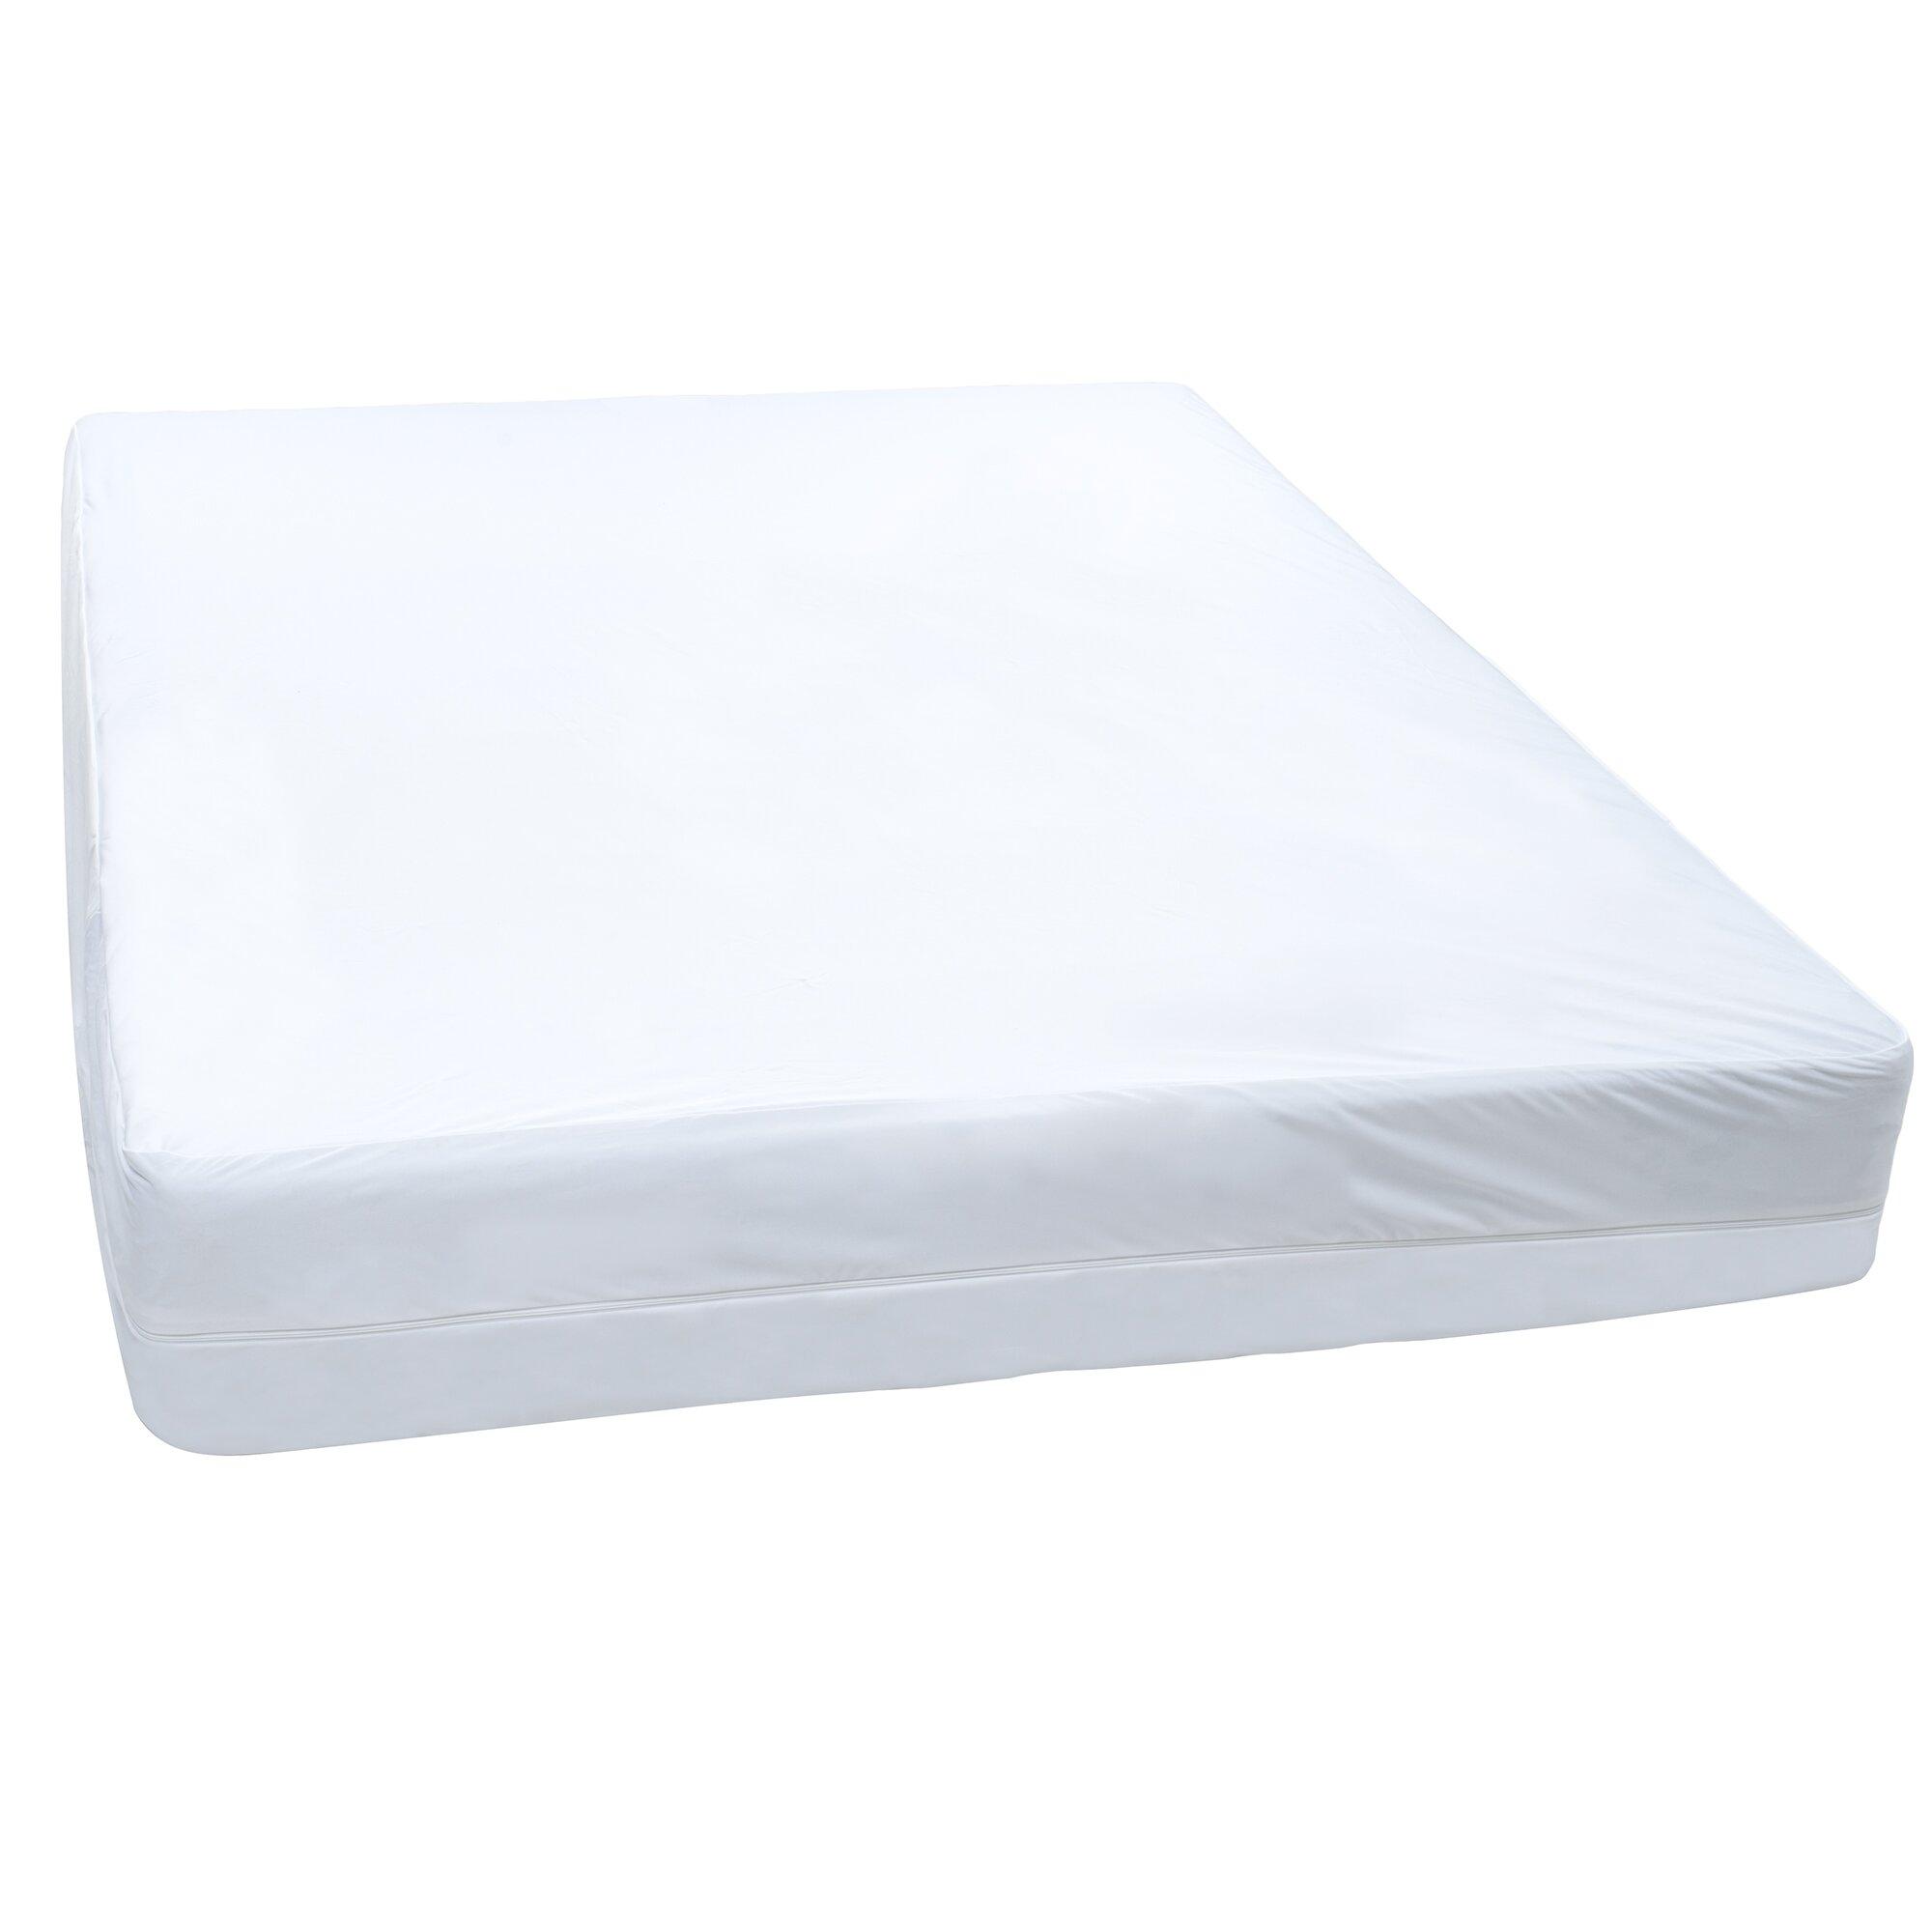 bed bug box spring waterproof mattress protector